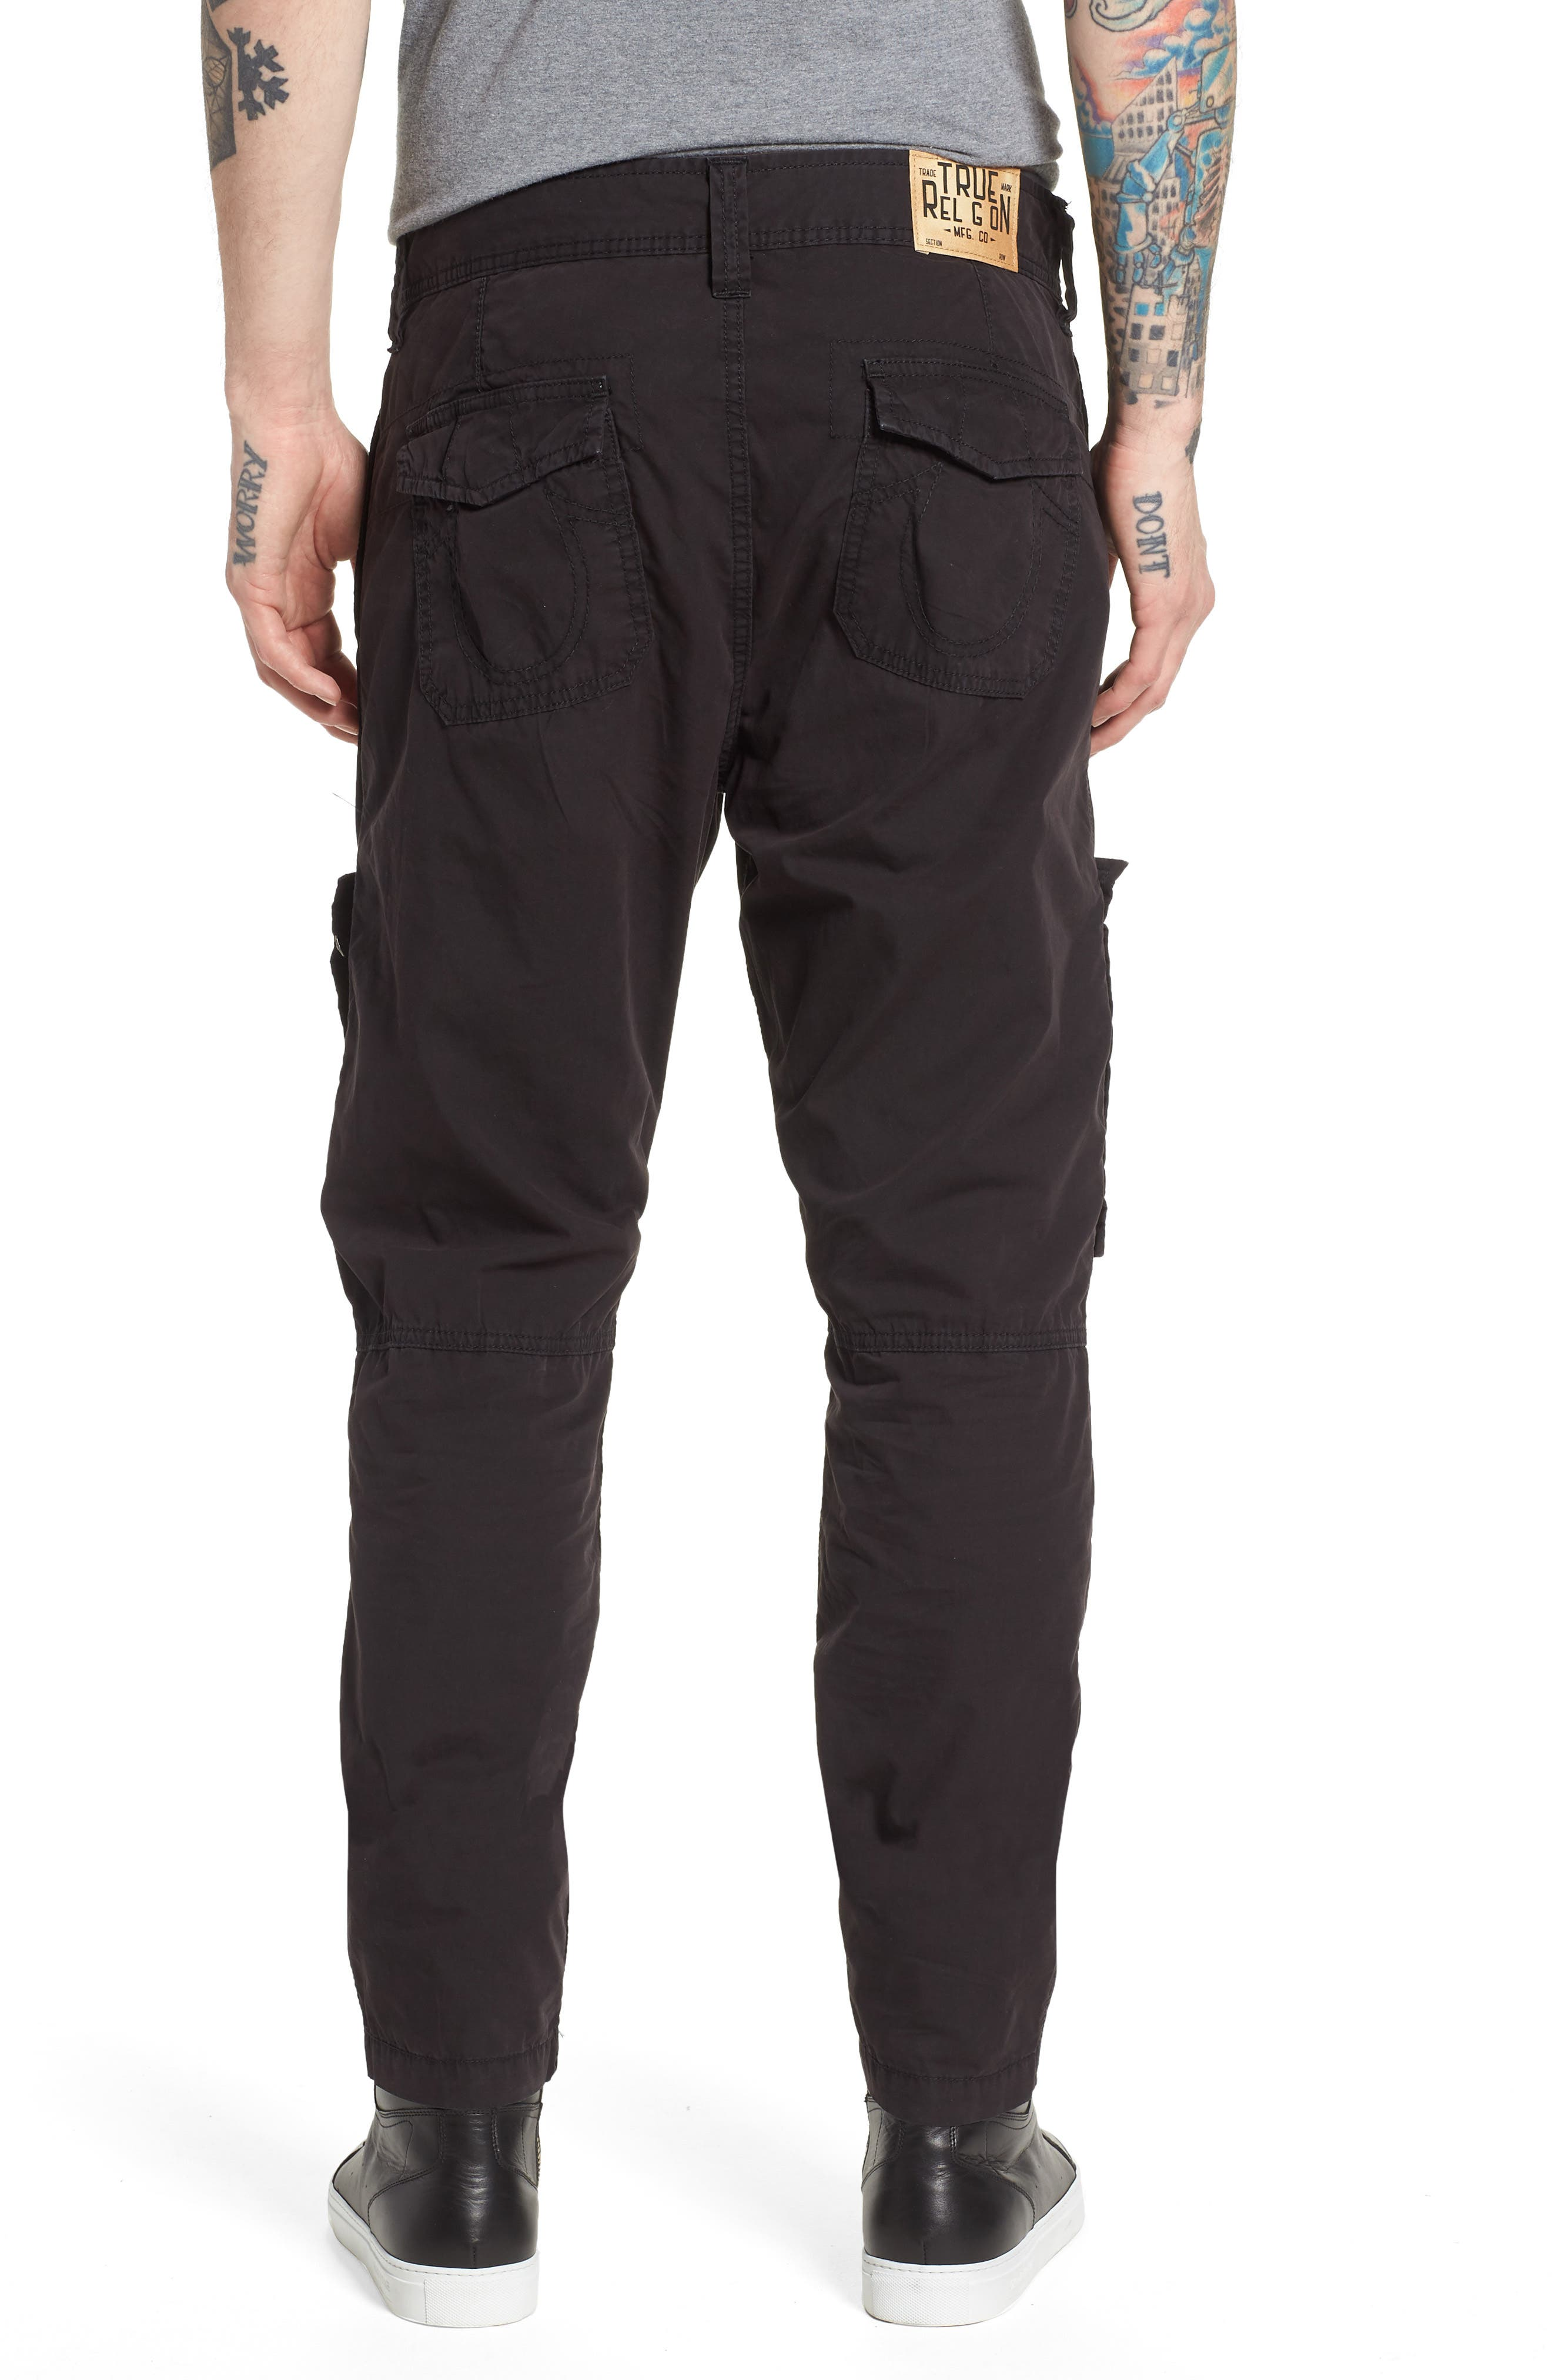 Officer Field Pants,                             Alternate thumbnail 2, color,                             Black